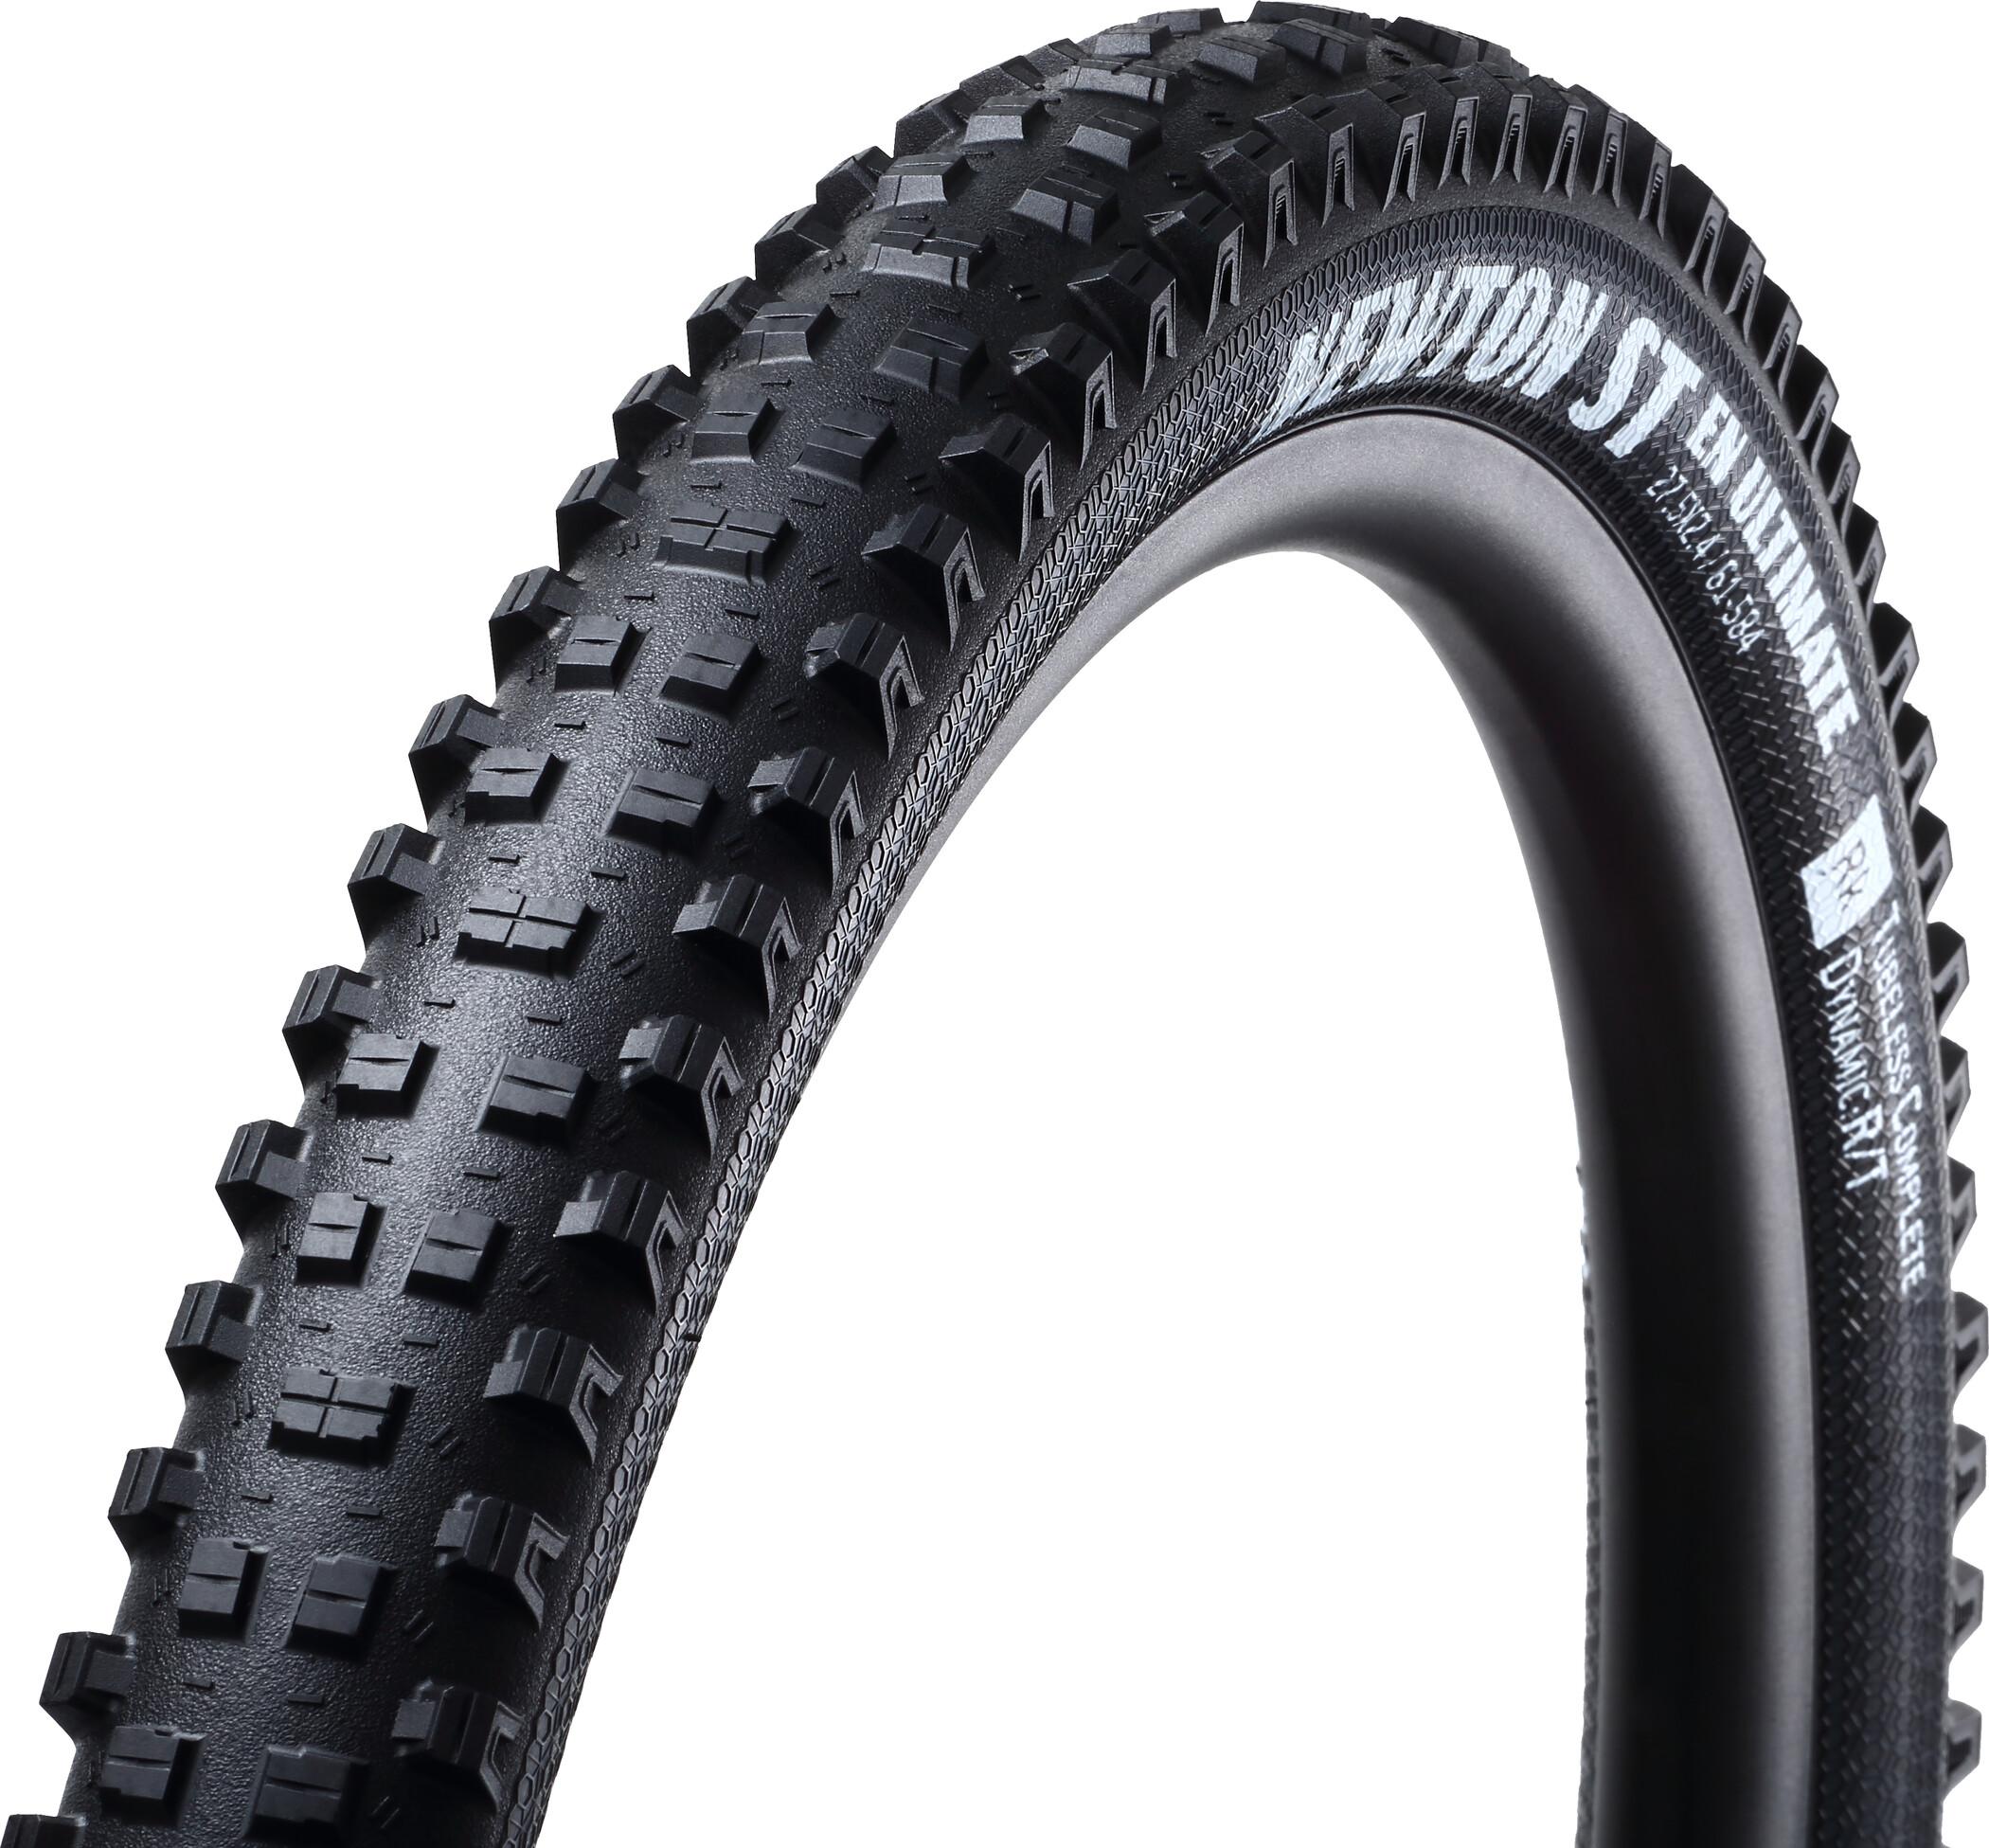 Goodyear Newton-ST EN Ultimate Foldedæk 66-622 Tubeless Complete Dynamic R/T e25, black (2019) | Tyres